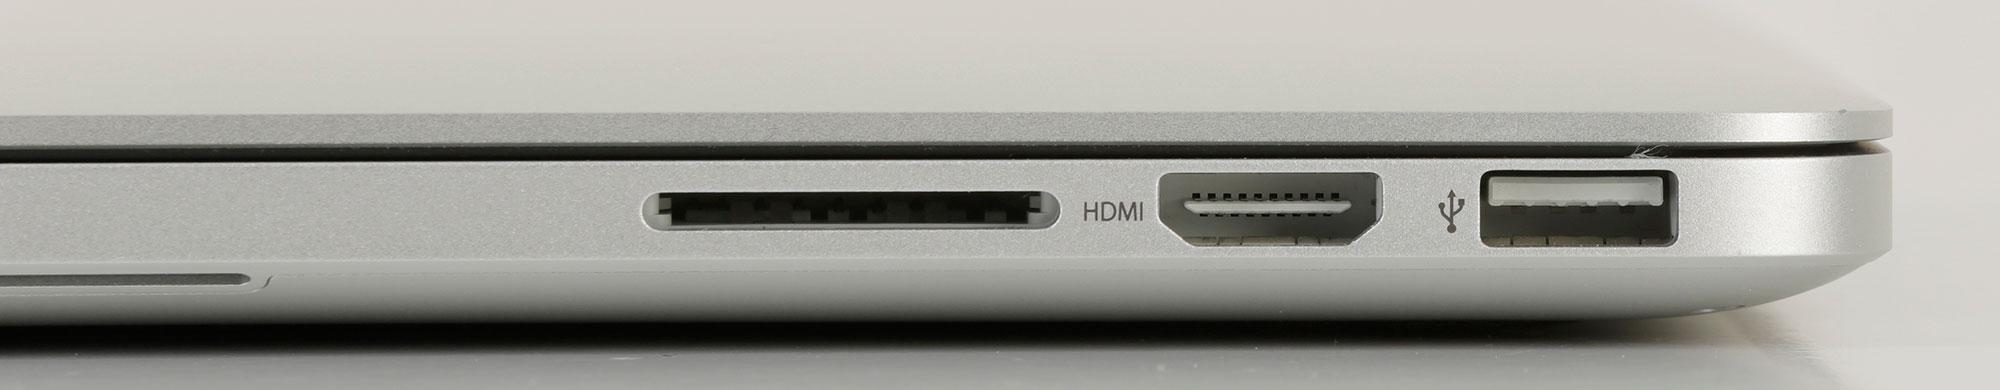 test-labo-fnac-apple-macbook-pro-15-2015-ports-droit